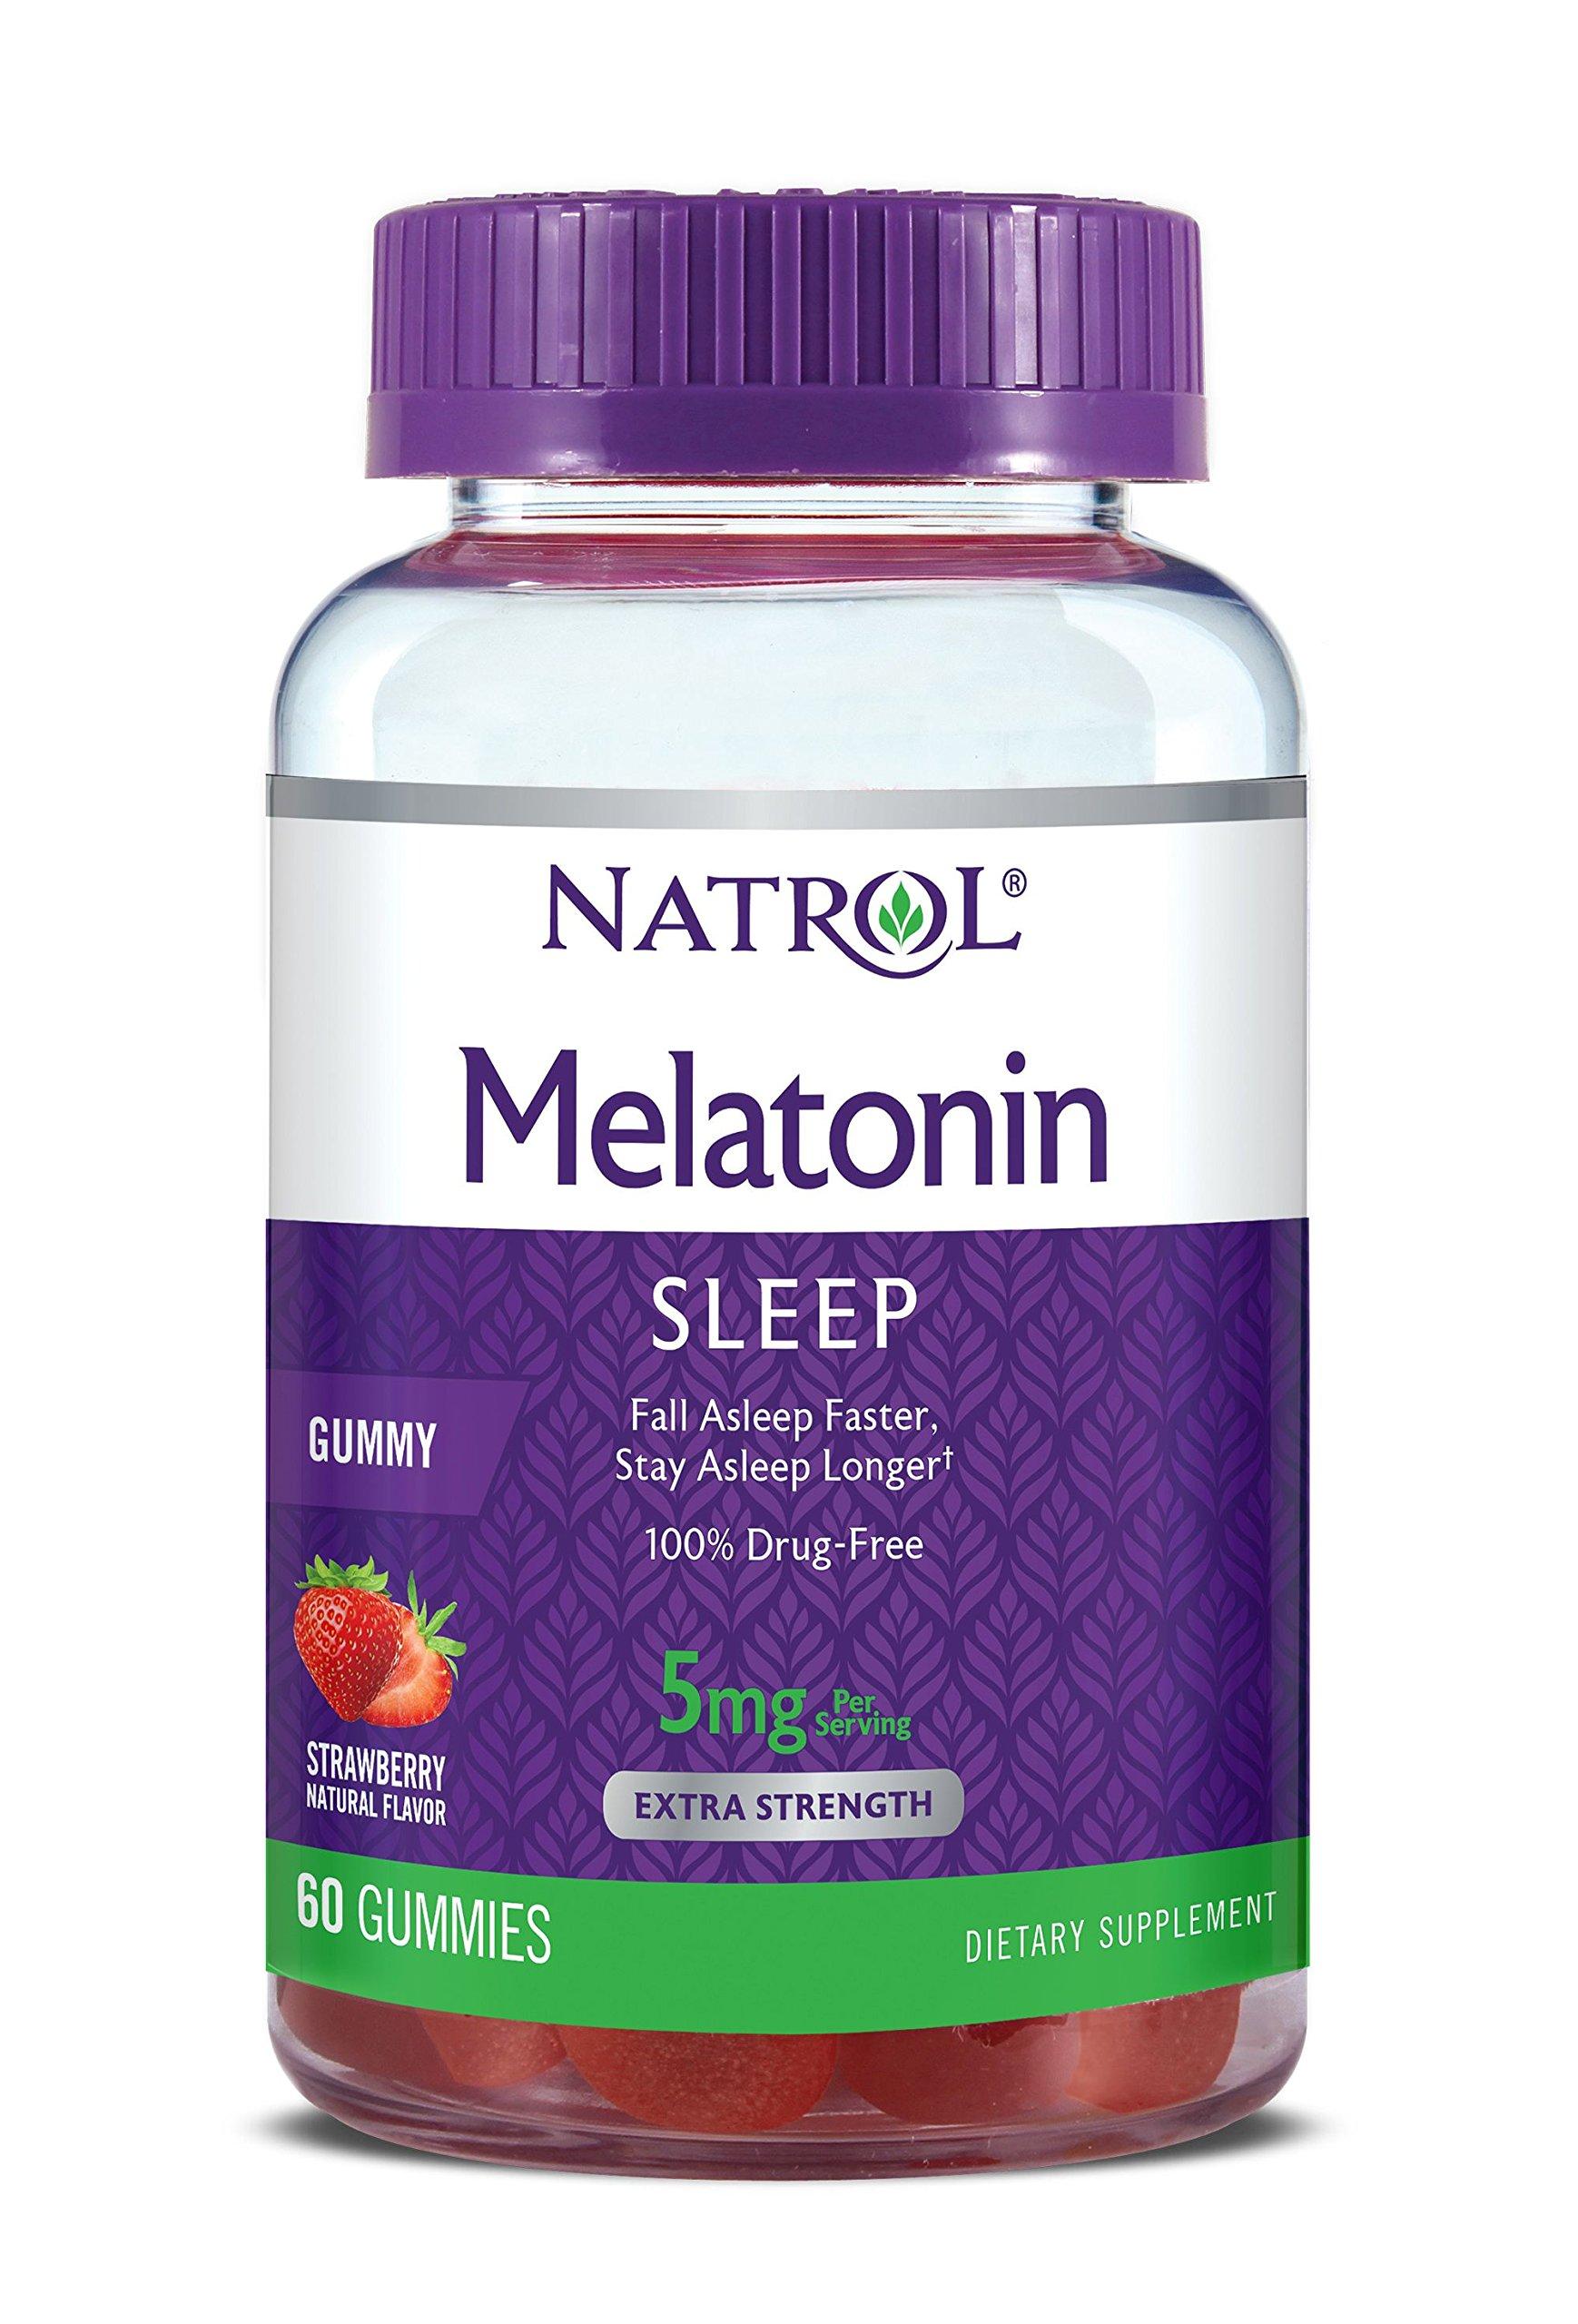 Natrol Melatonin Gummies Strawberry flavor, 5mg, 60 Count